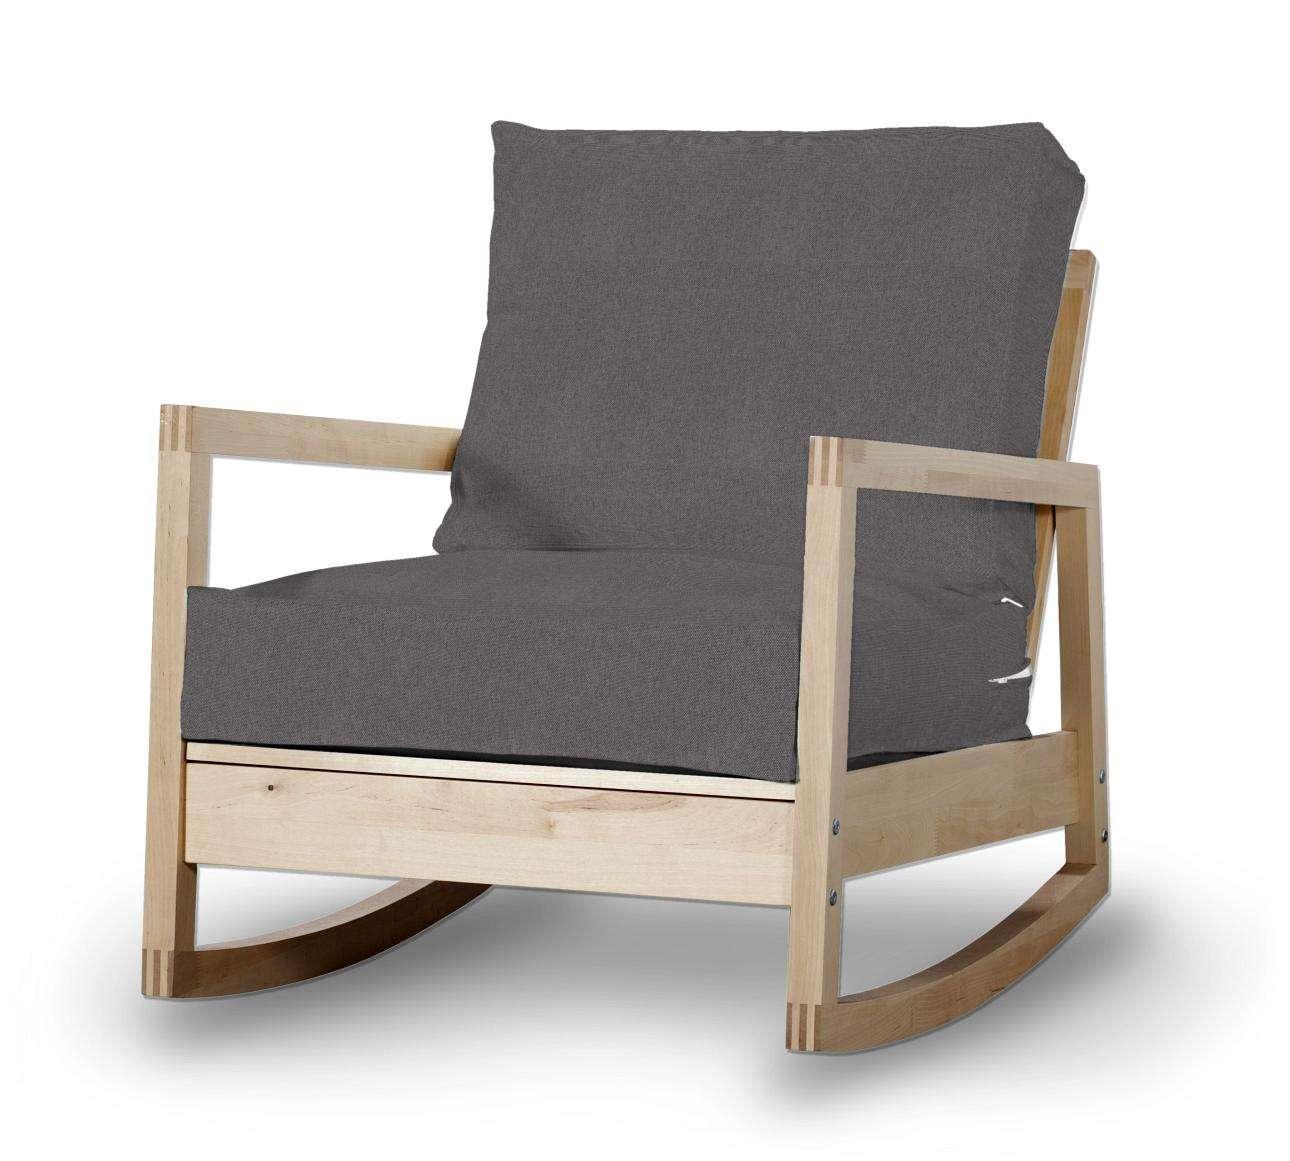 Pokrowiec na fotel Lillberg Fotel Lillberg w kolekcji Etna , tkanina: 705-35